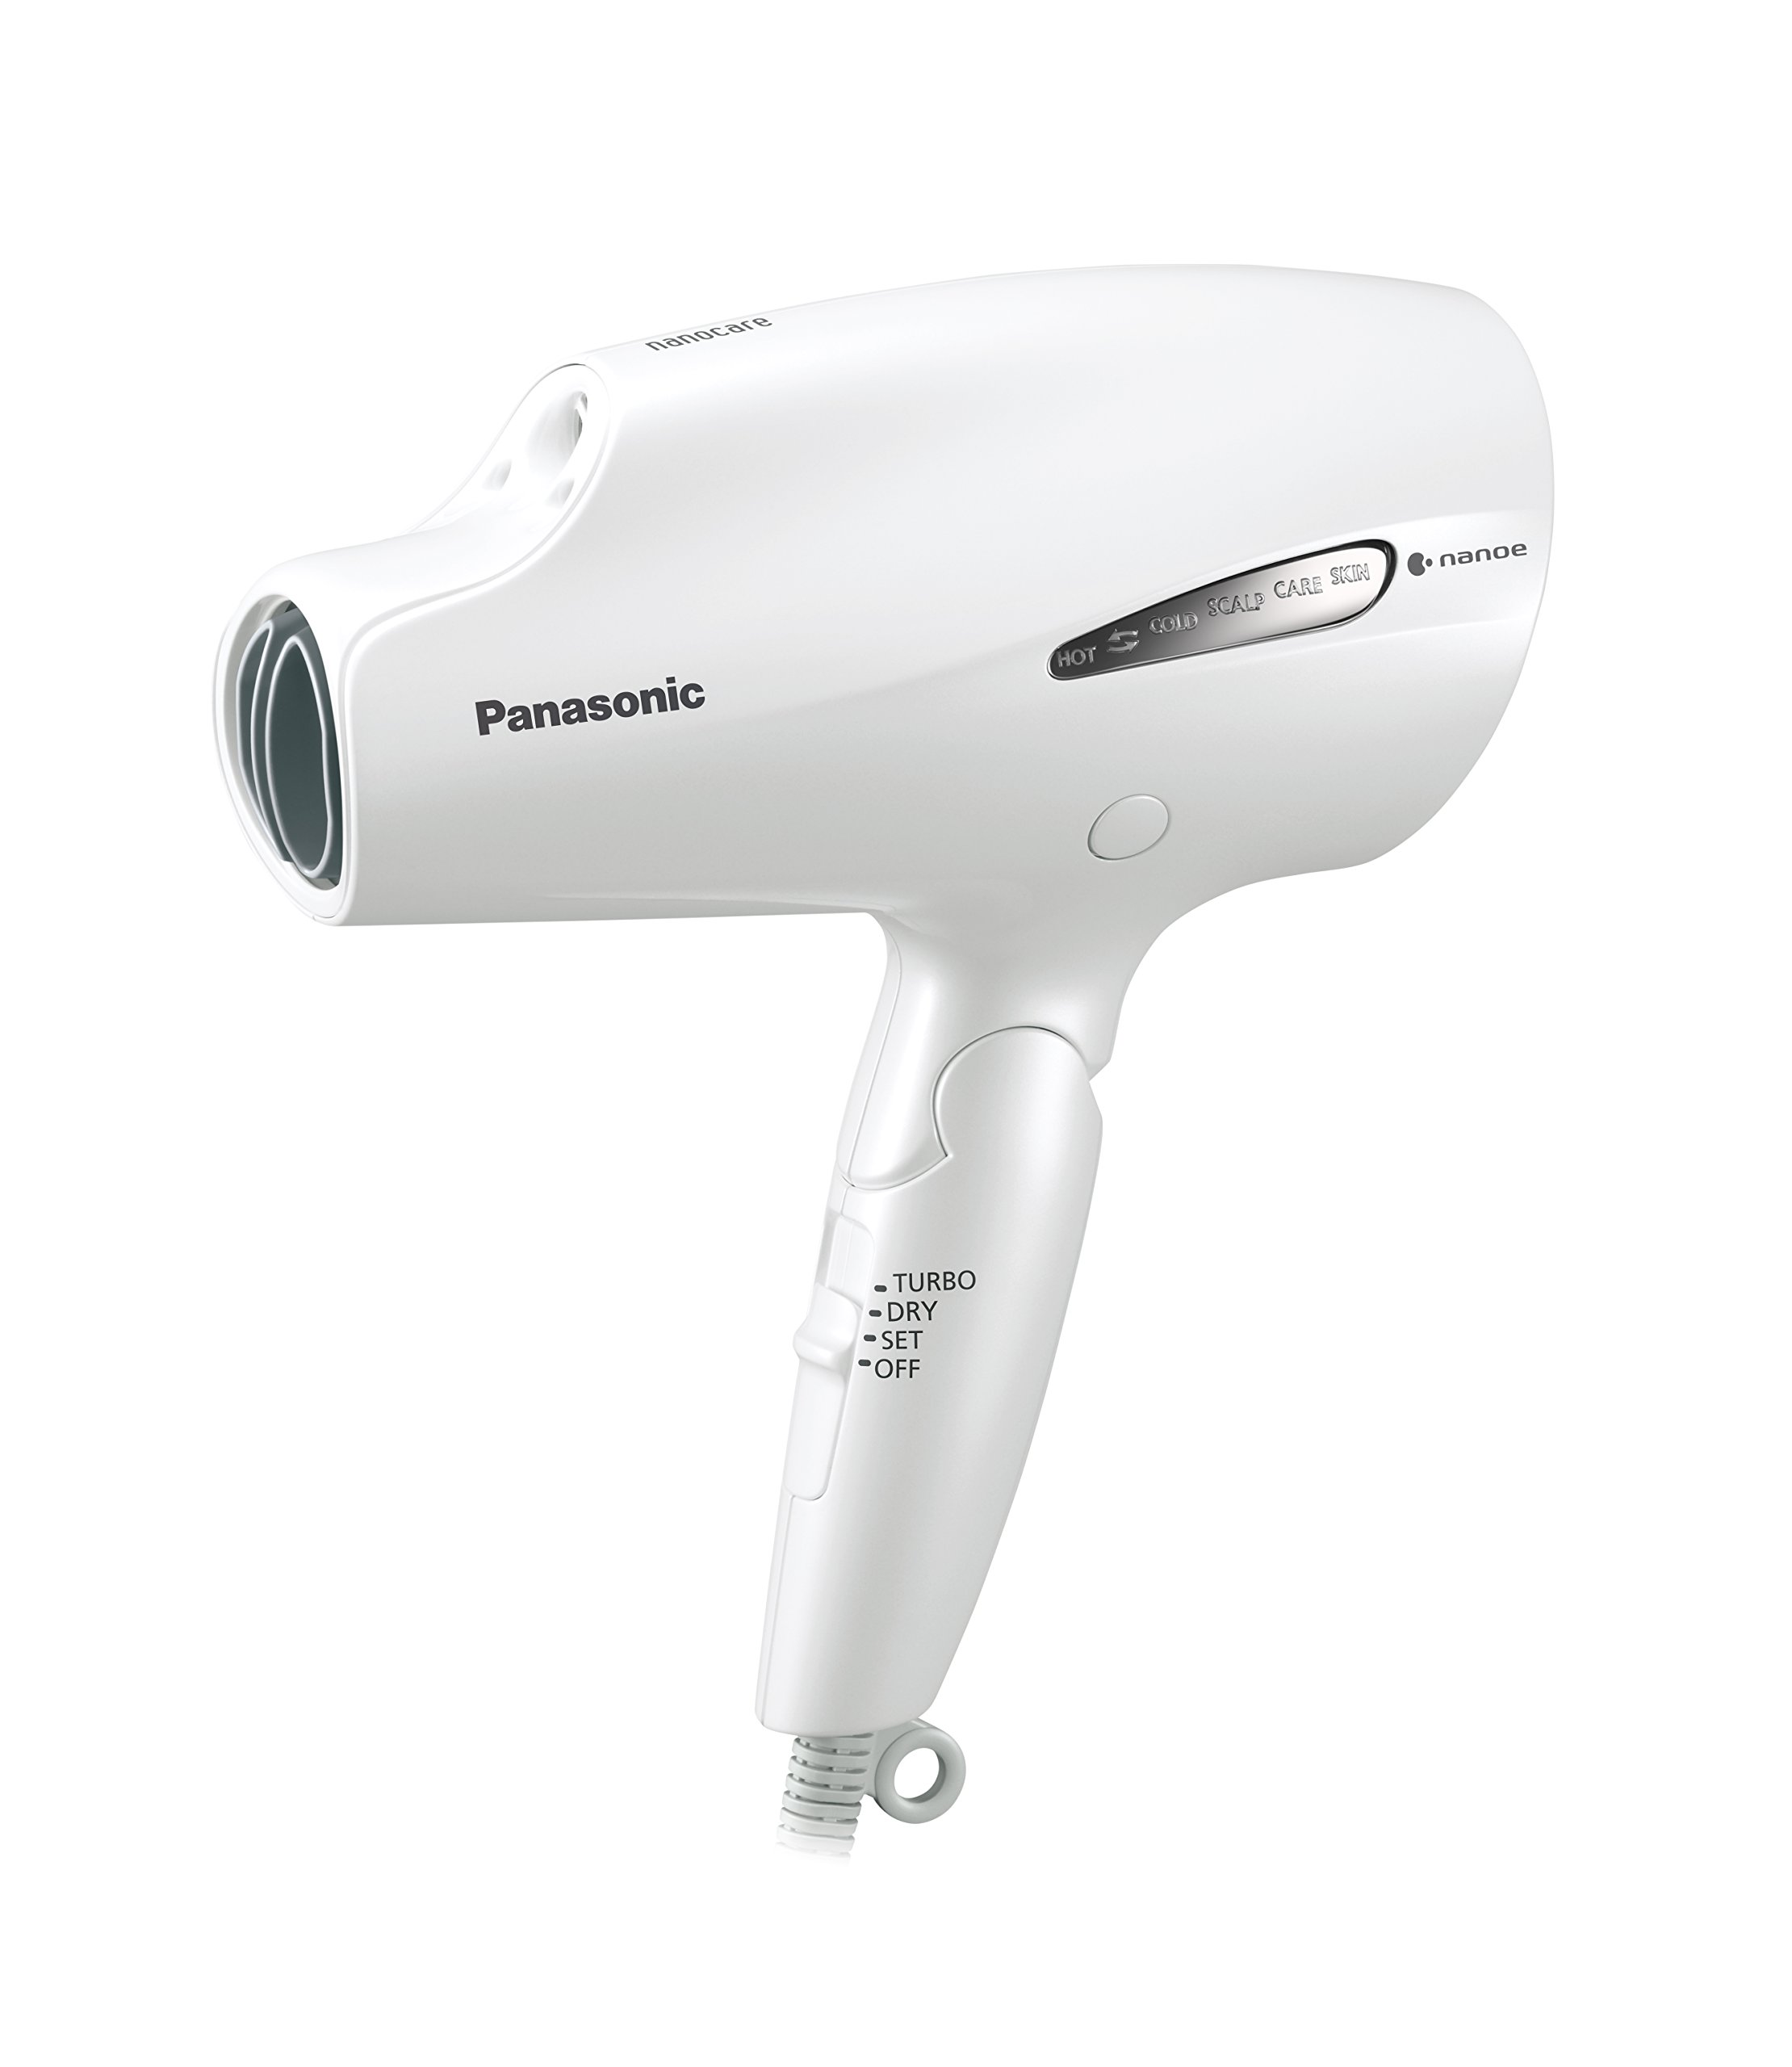 Panasonic hair dryer Nanokea white EH-NA99-W(Japan Import-No Warranty)